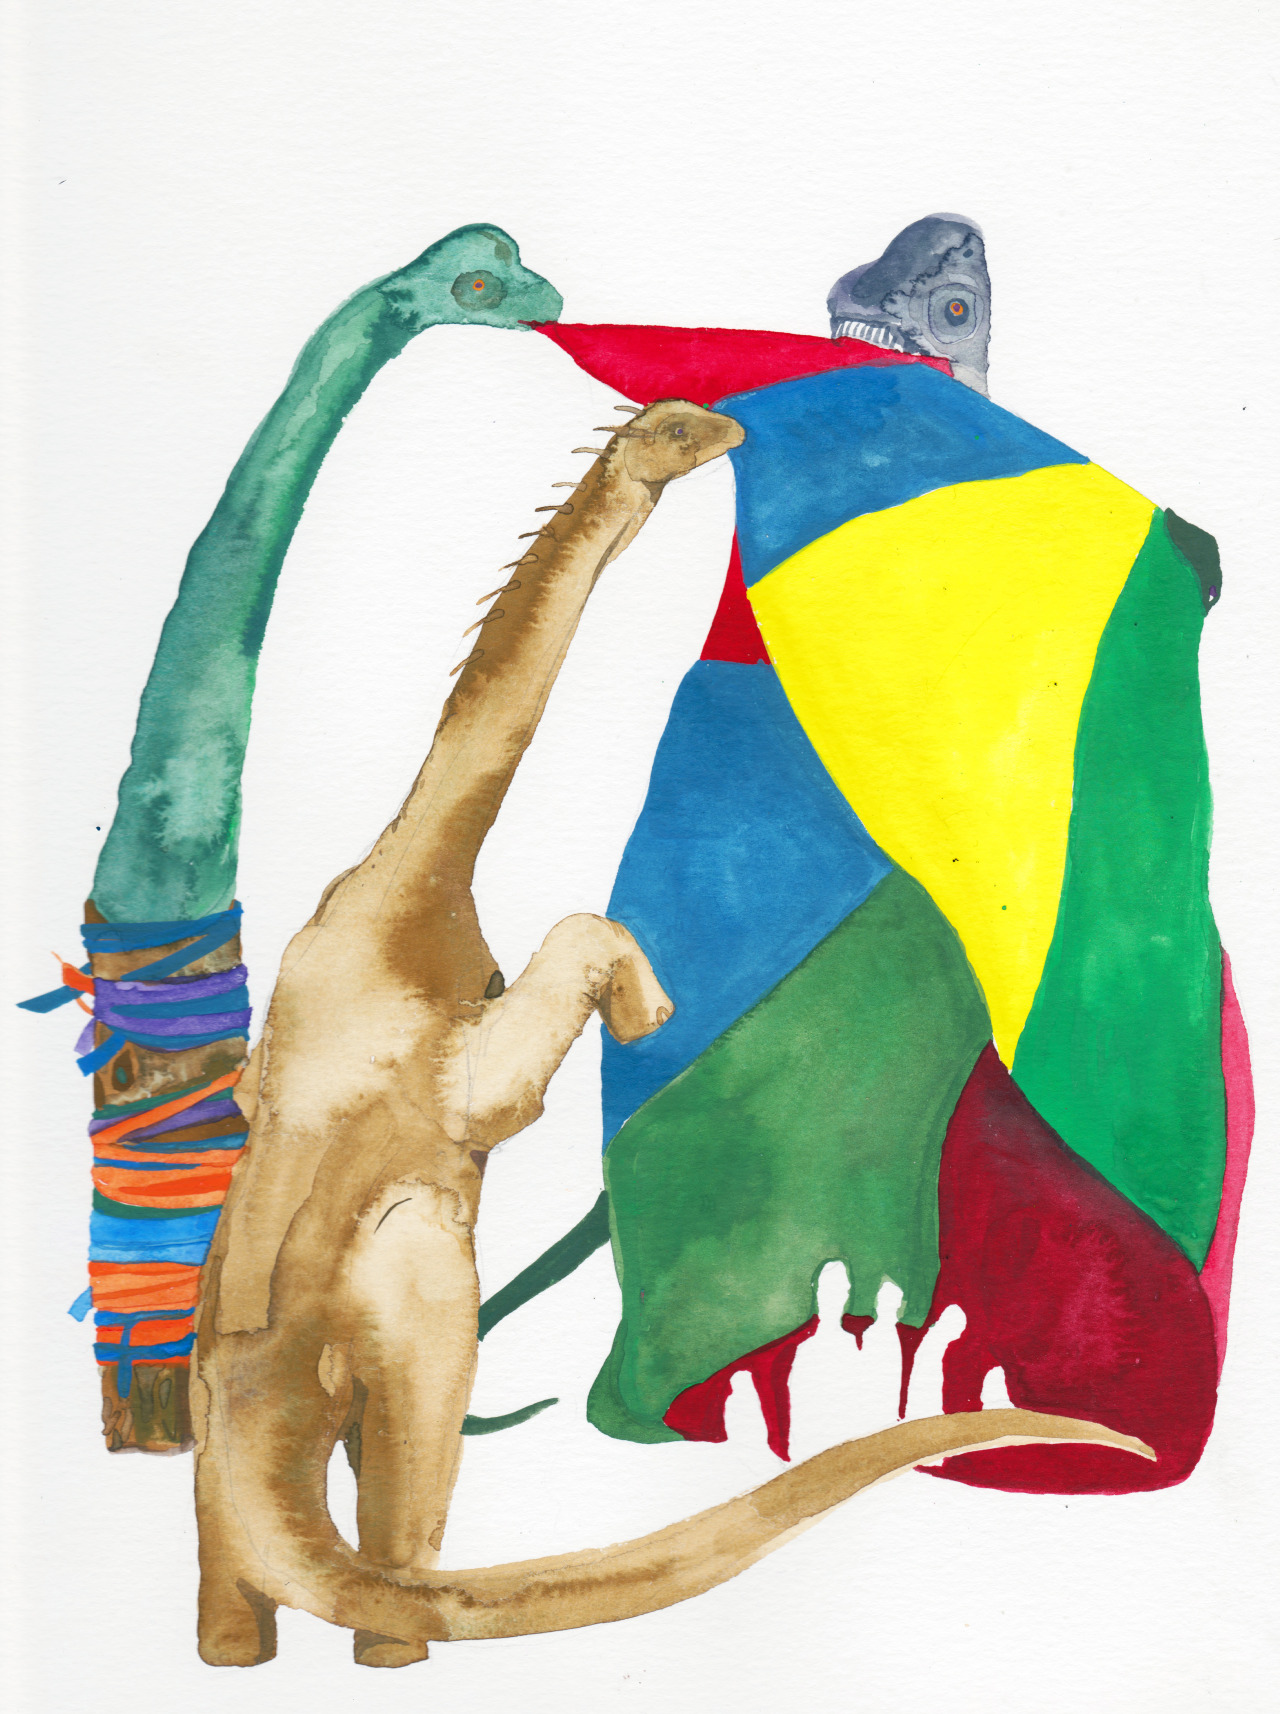 Shrine for Dinosaurs: Sauropods